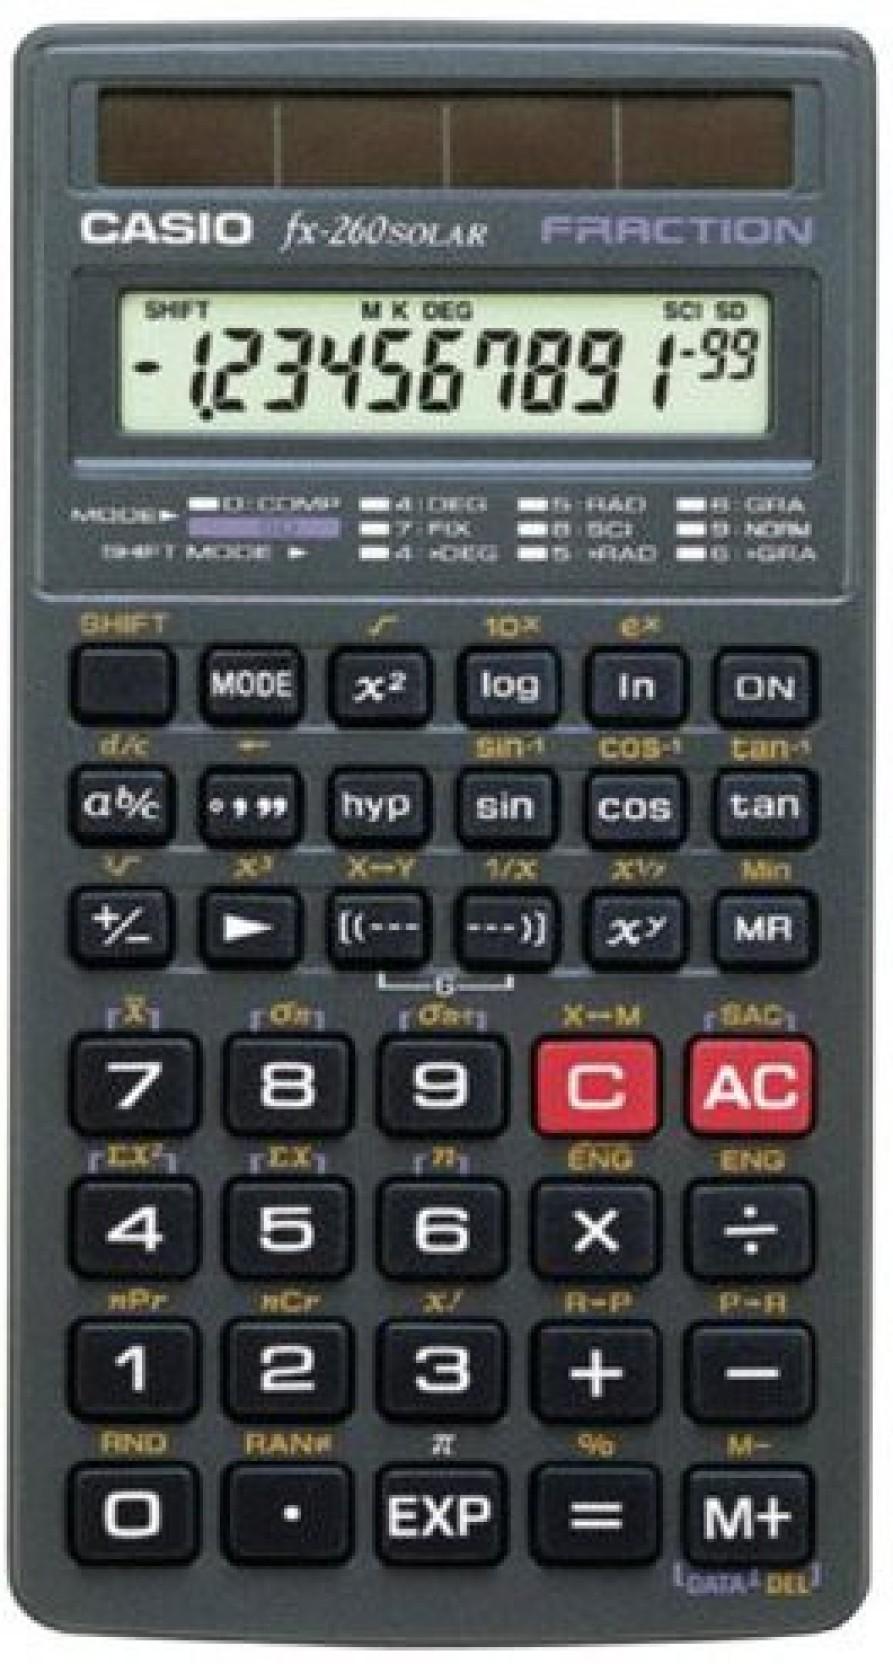 Qoo10 casio fx-260 solar scientific calculator all-purpose.